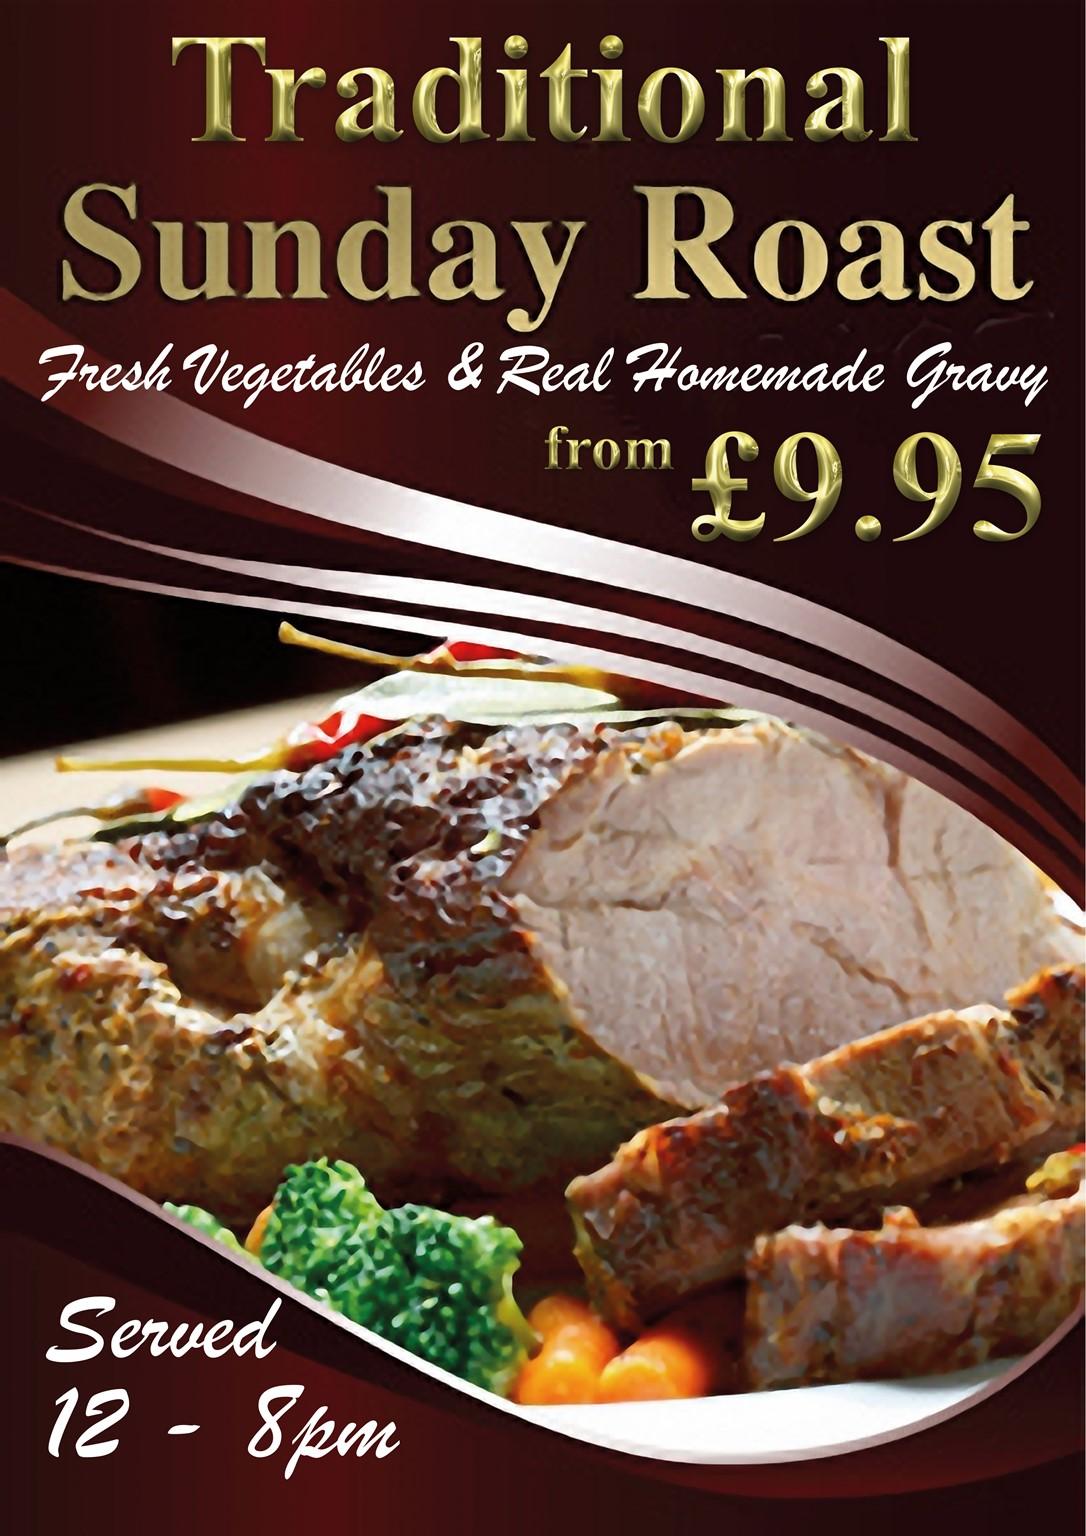 Traditional Homemade Sunday Roast Lunch